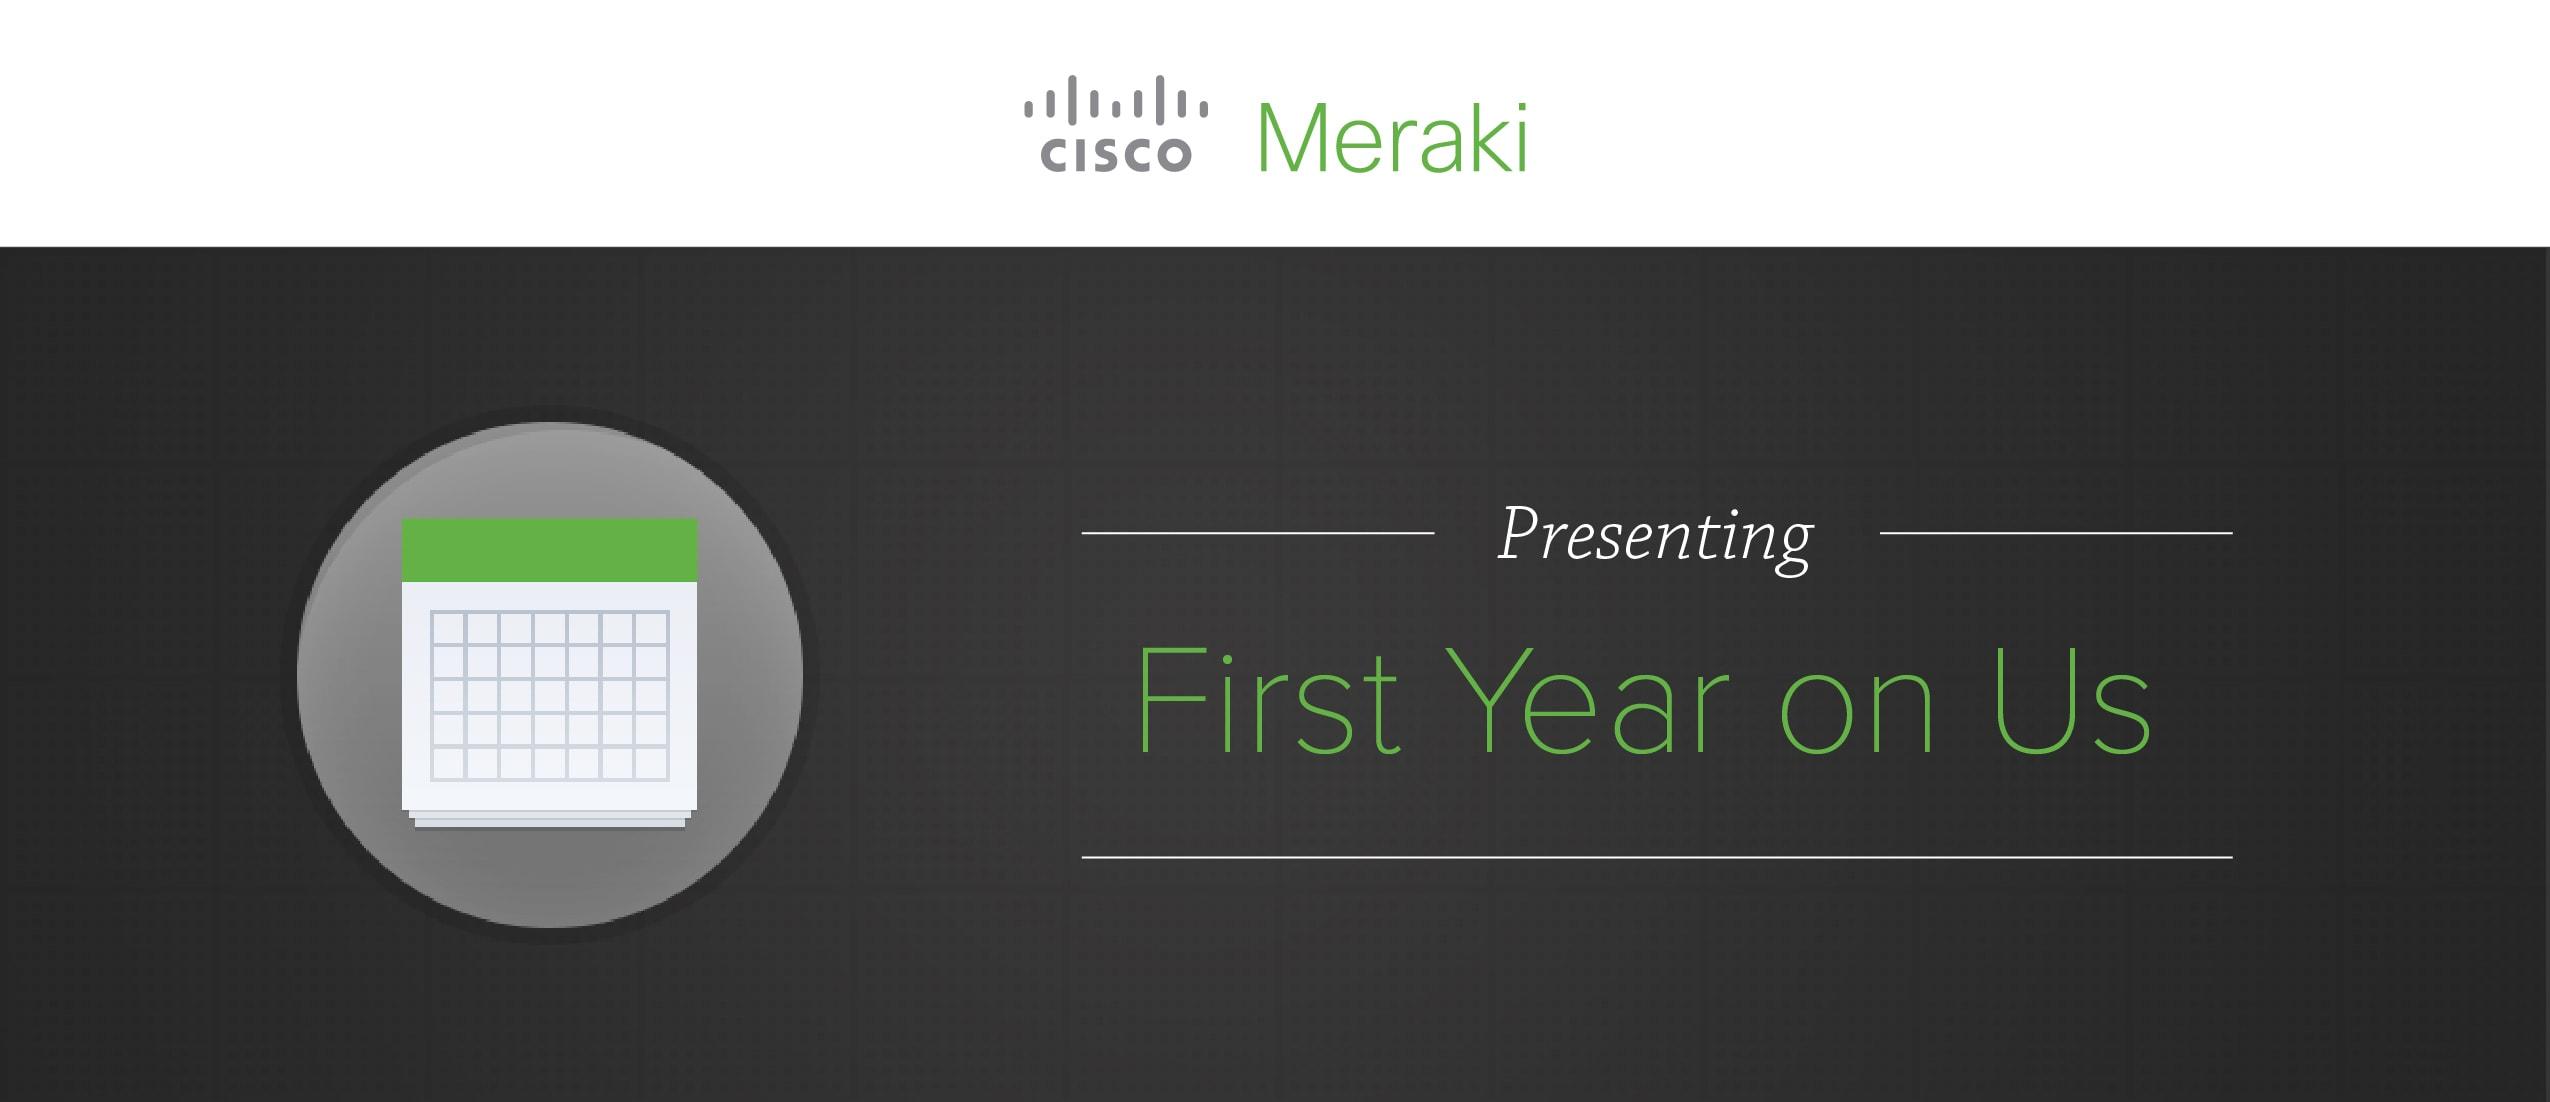 Meraki First Year on Us Banner-01